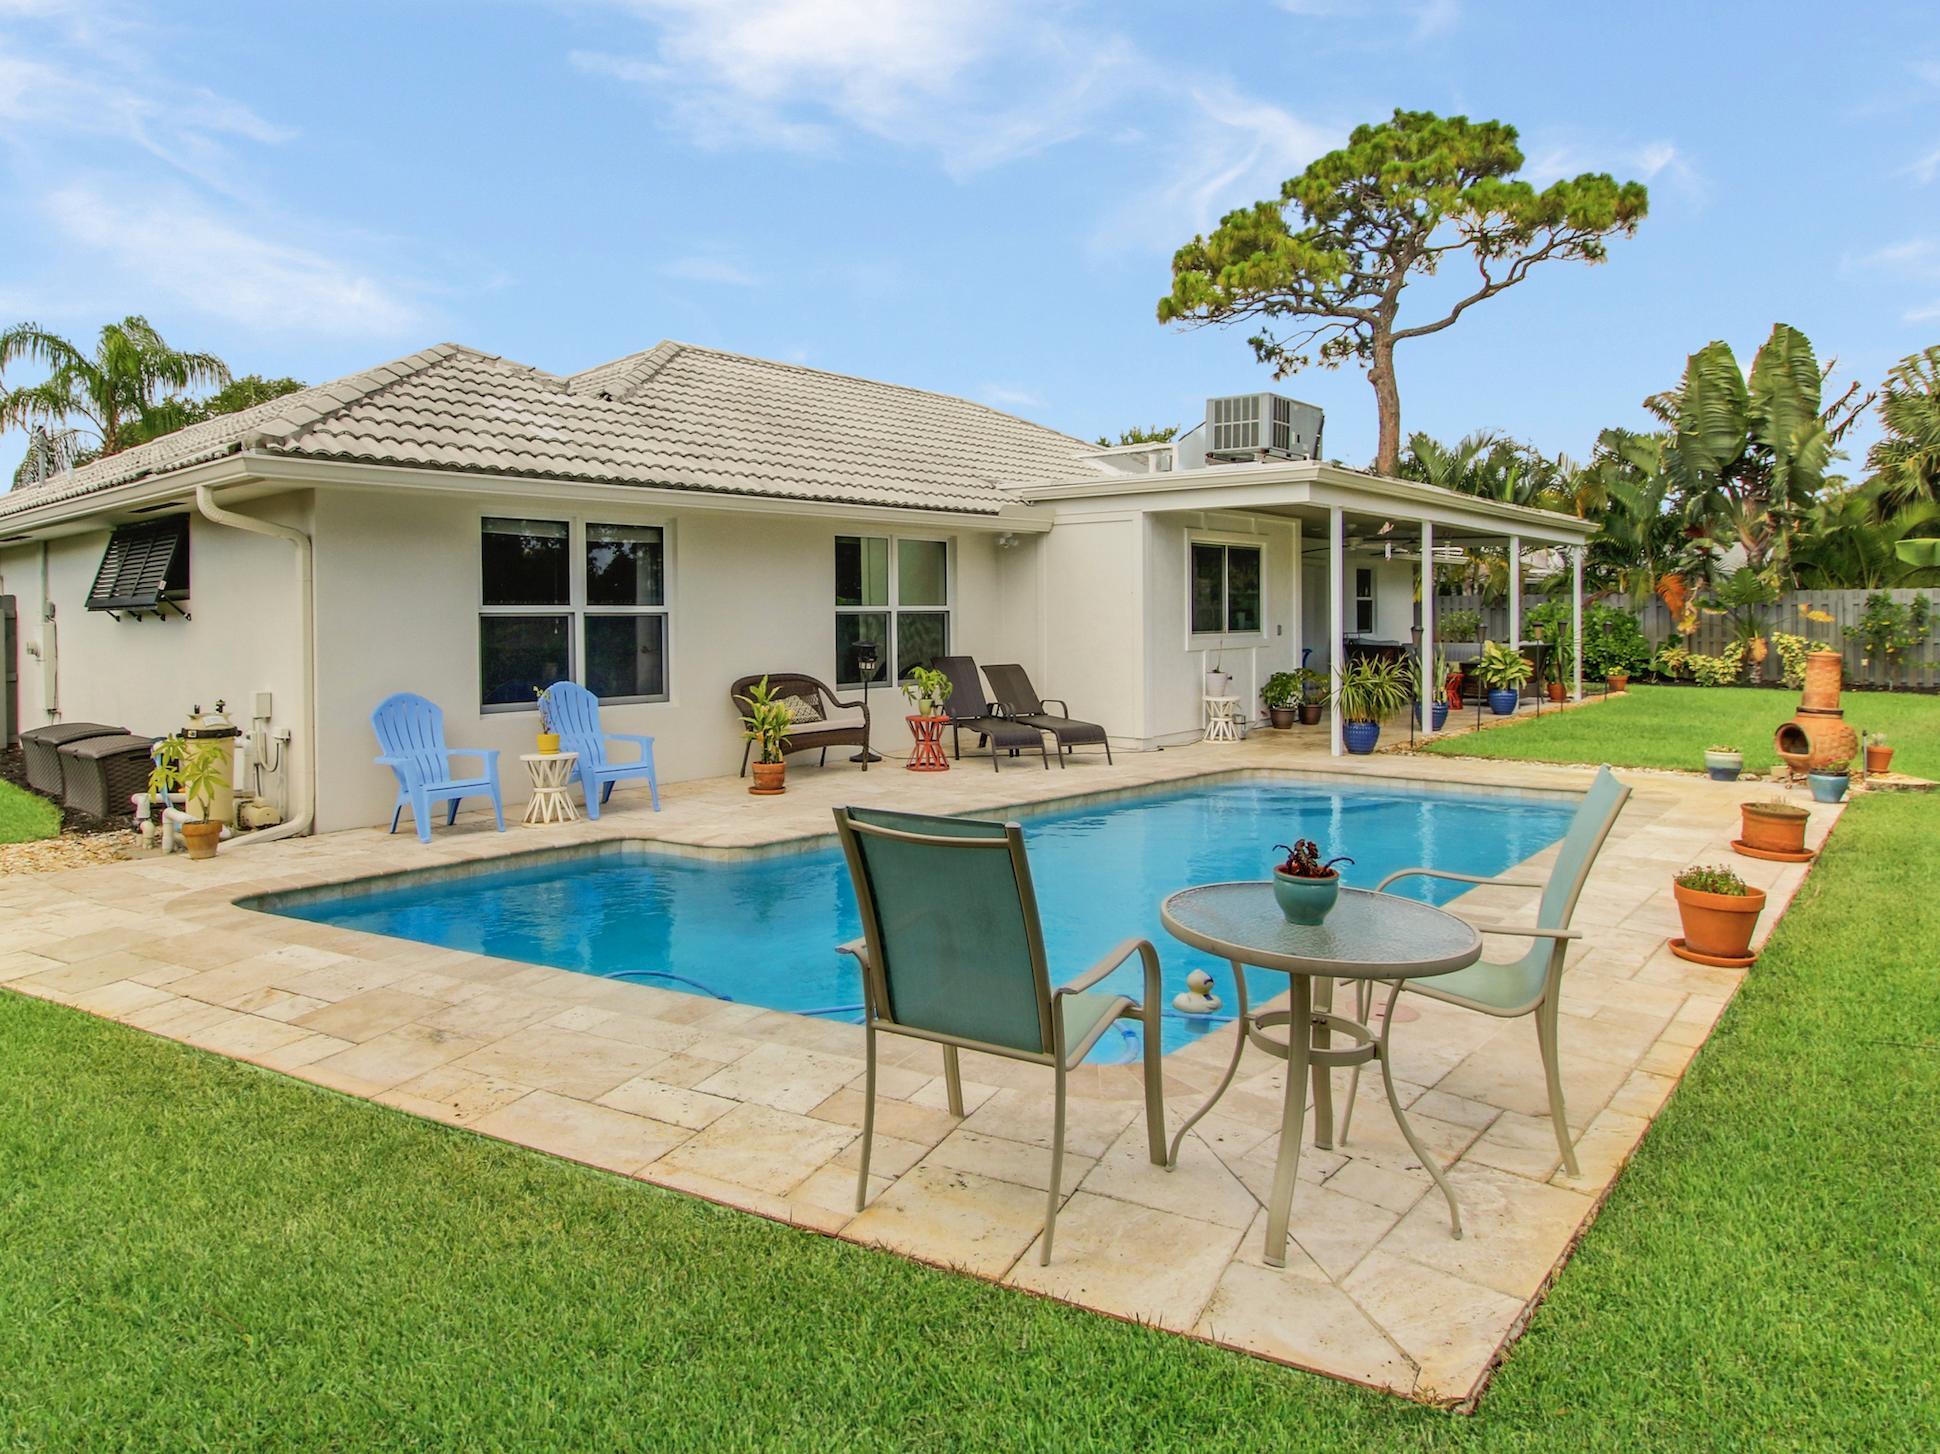 354 Country Club Drive Tequesta, FL 33469